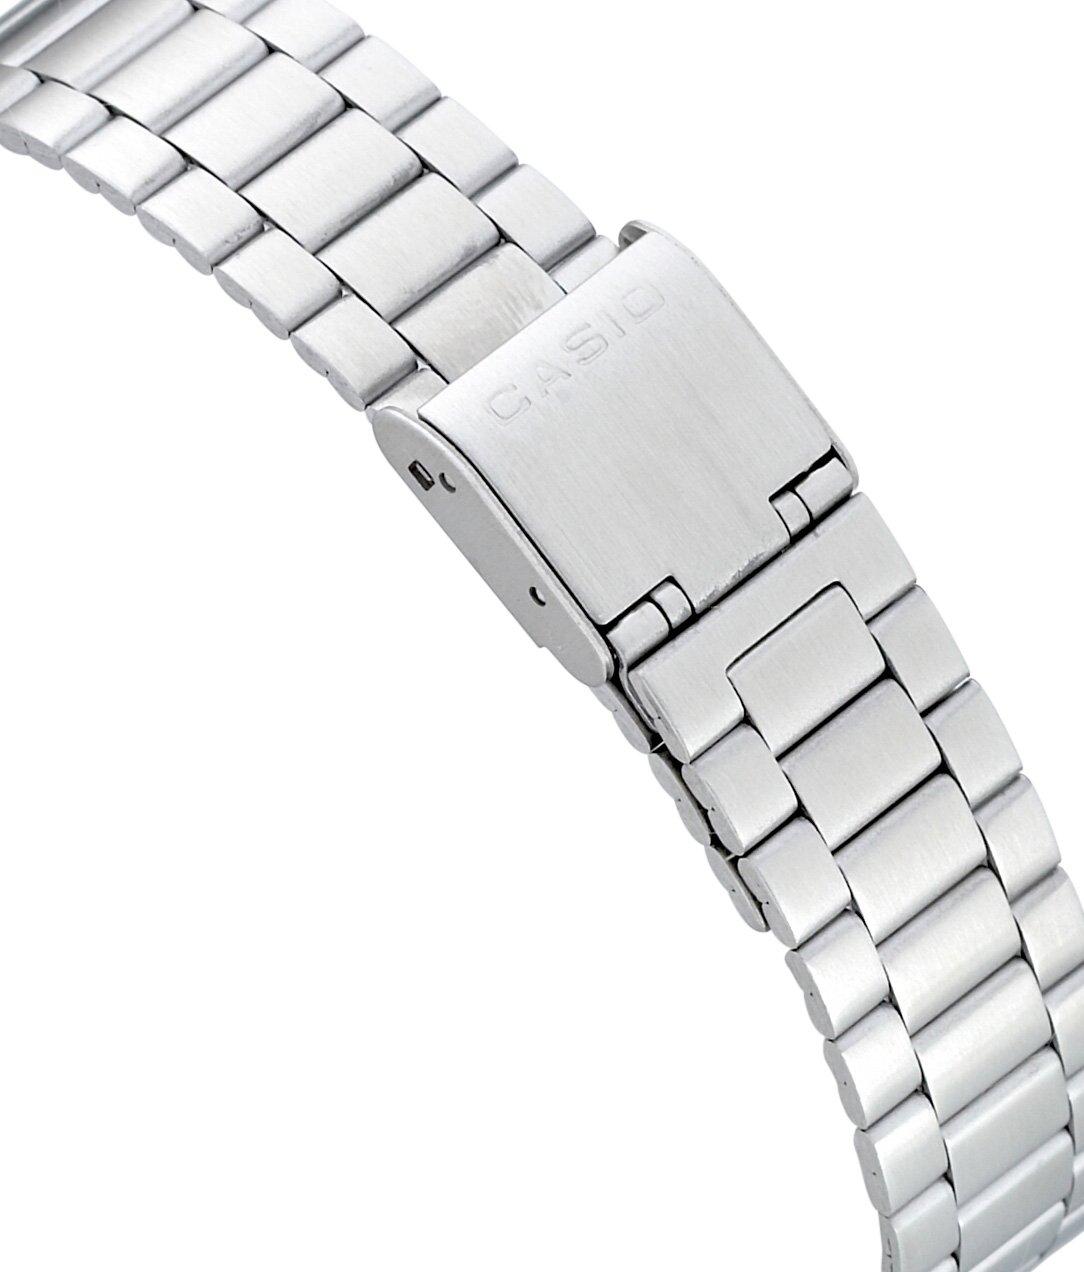 Casio Men's A168W-1 Stainless Steel Watch 1